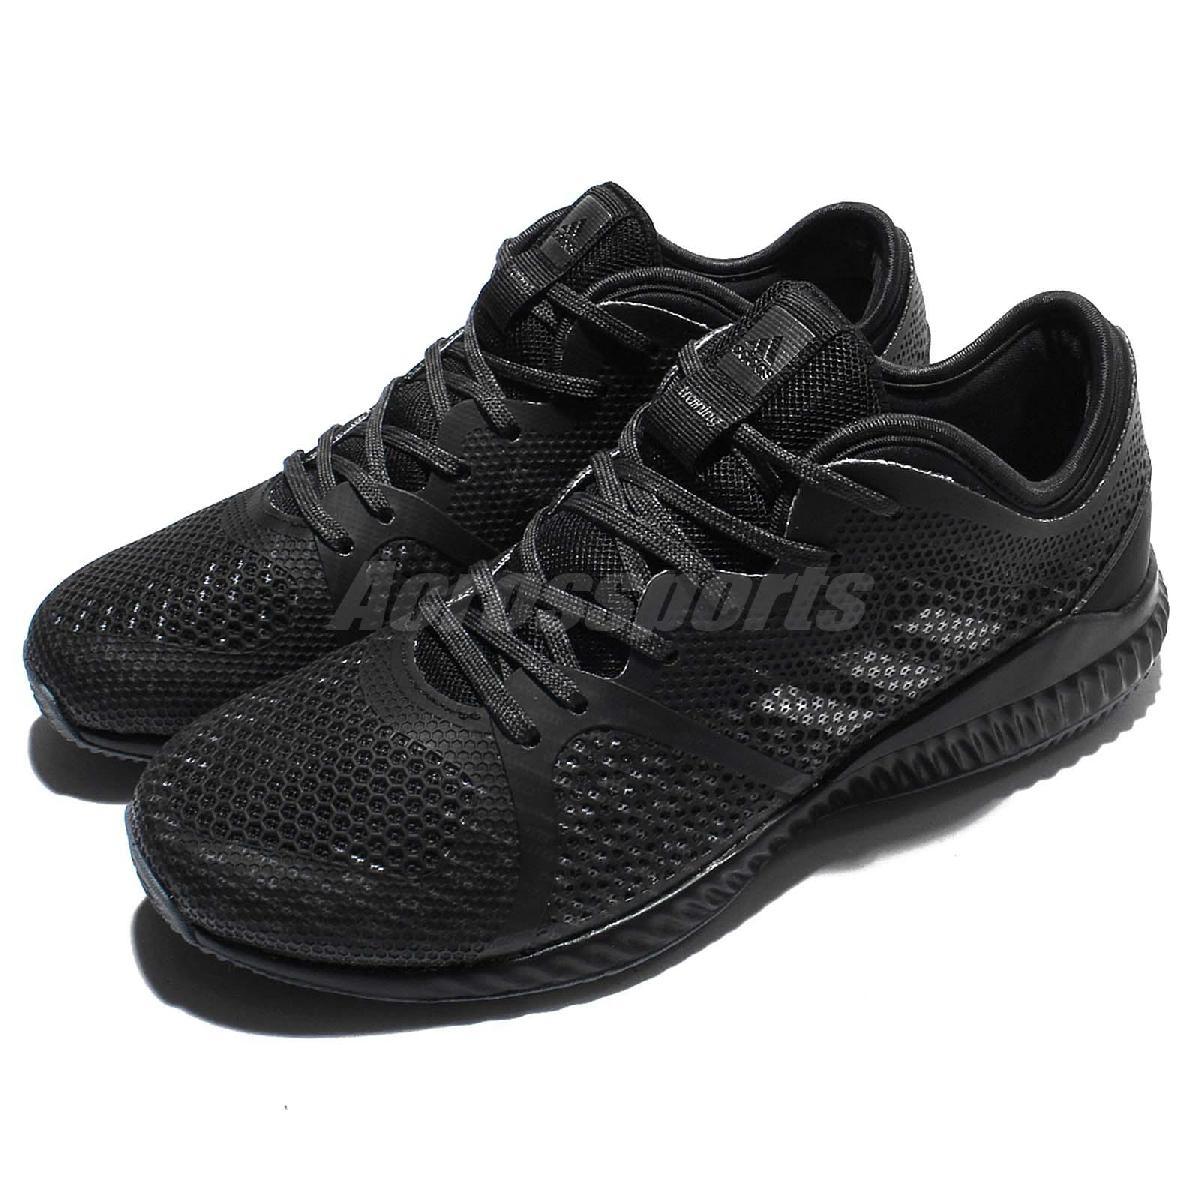 adidas 訓練鞋 CrazyTrain Pro 黑 白 全黑 健身專用 女鞋 運動鞋【PUMP306】 BA9815